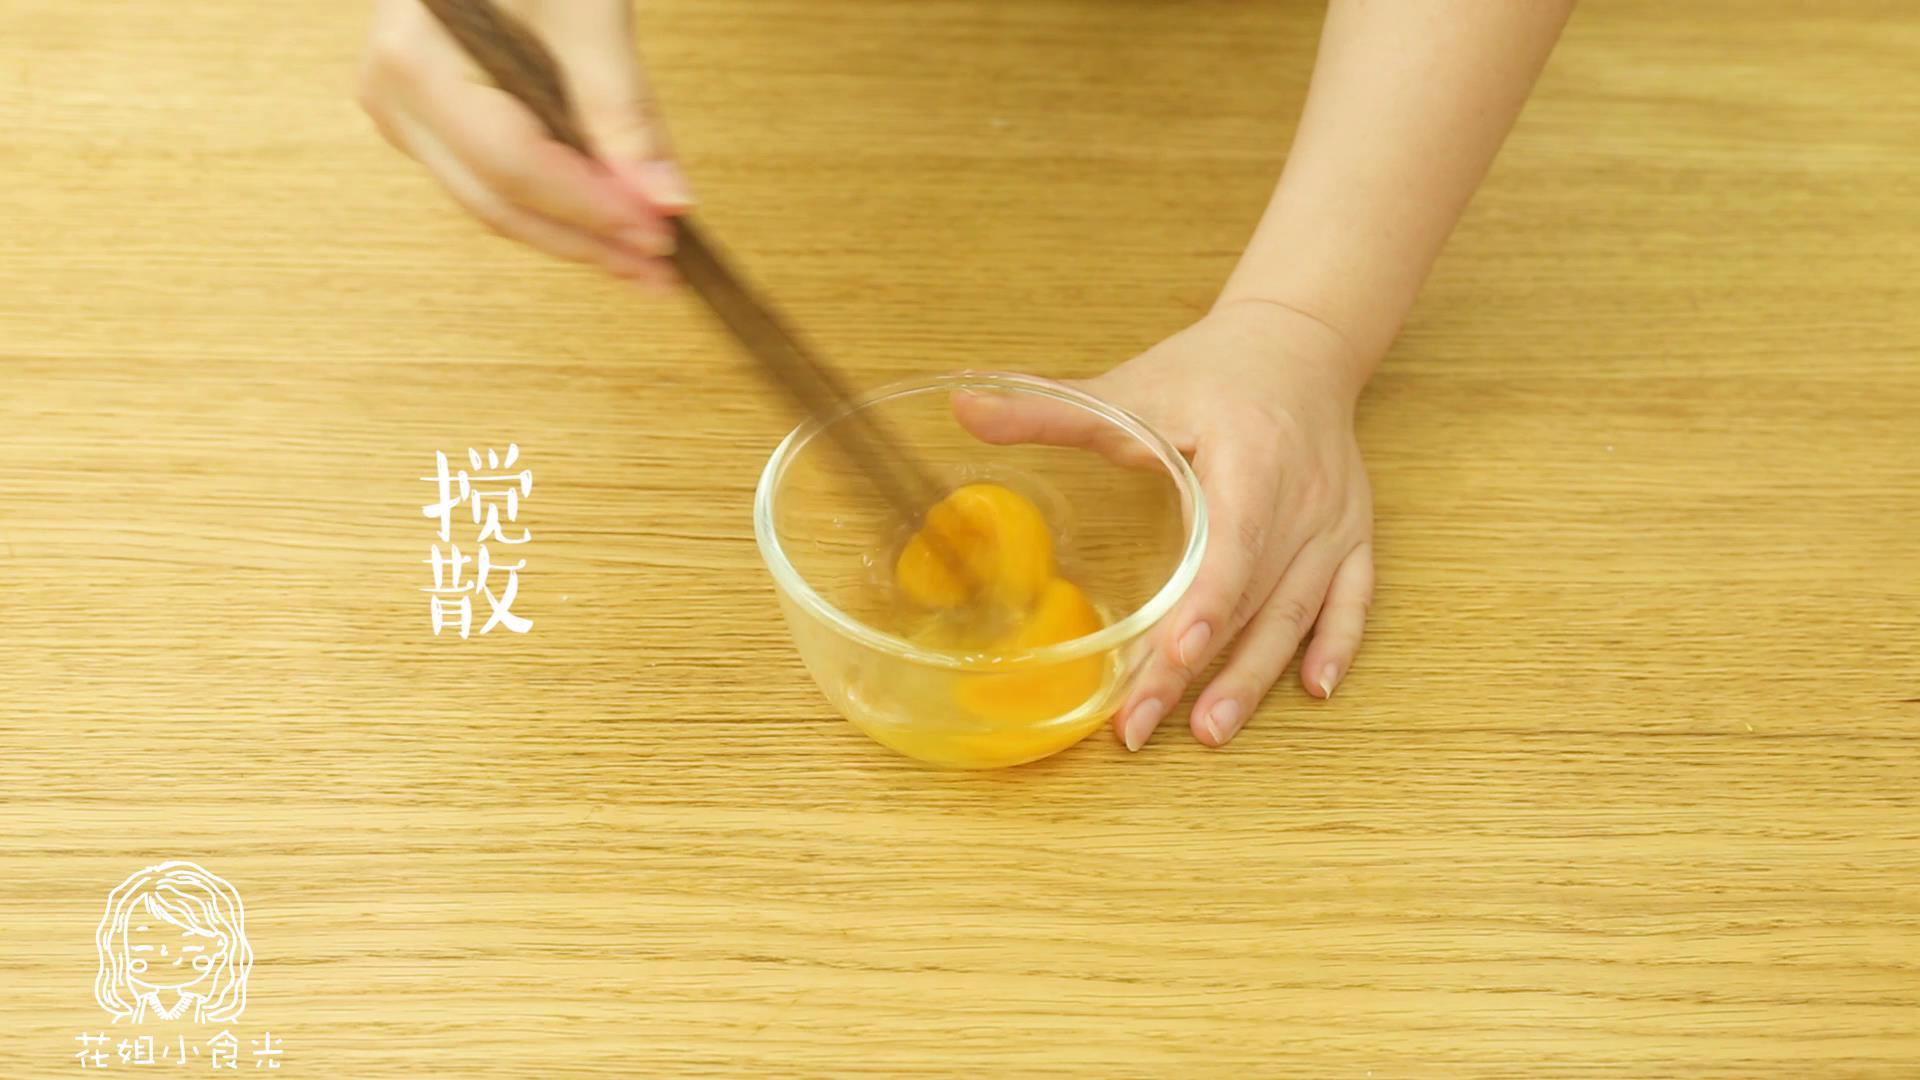 18m+菠萝炒饭,将两个鸡蛋打散搅拌,加入一丢丢水~</p> <p>tips:这样炒出来的鸡蛋更嫩哦